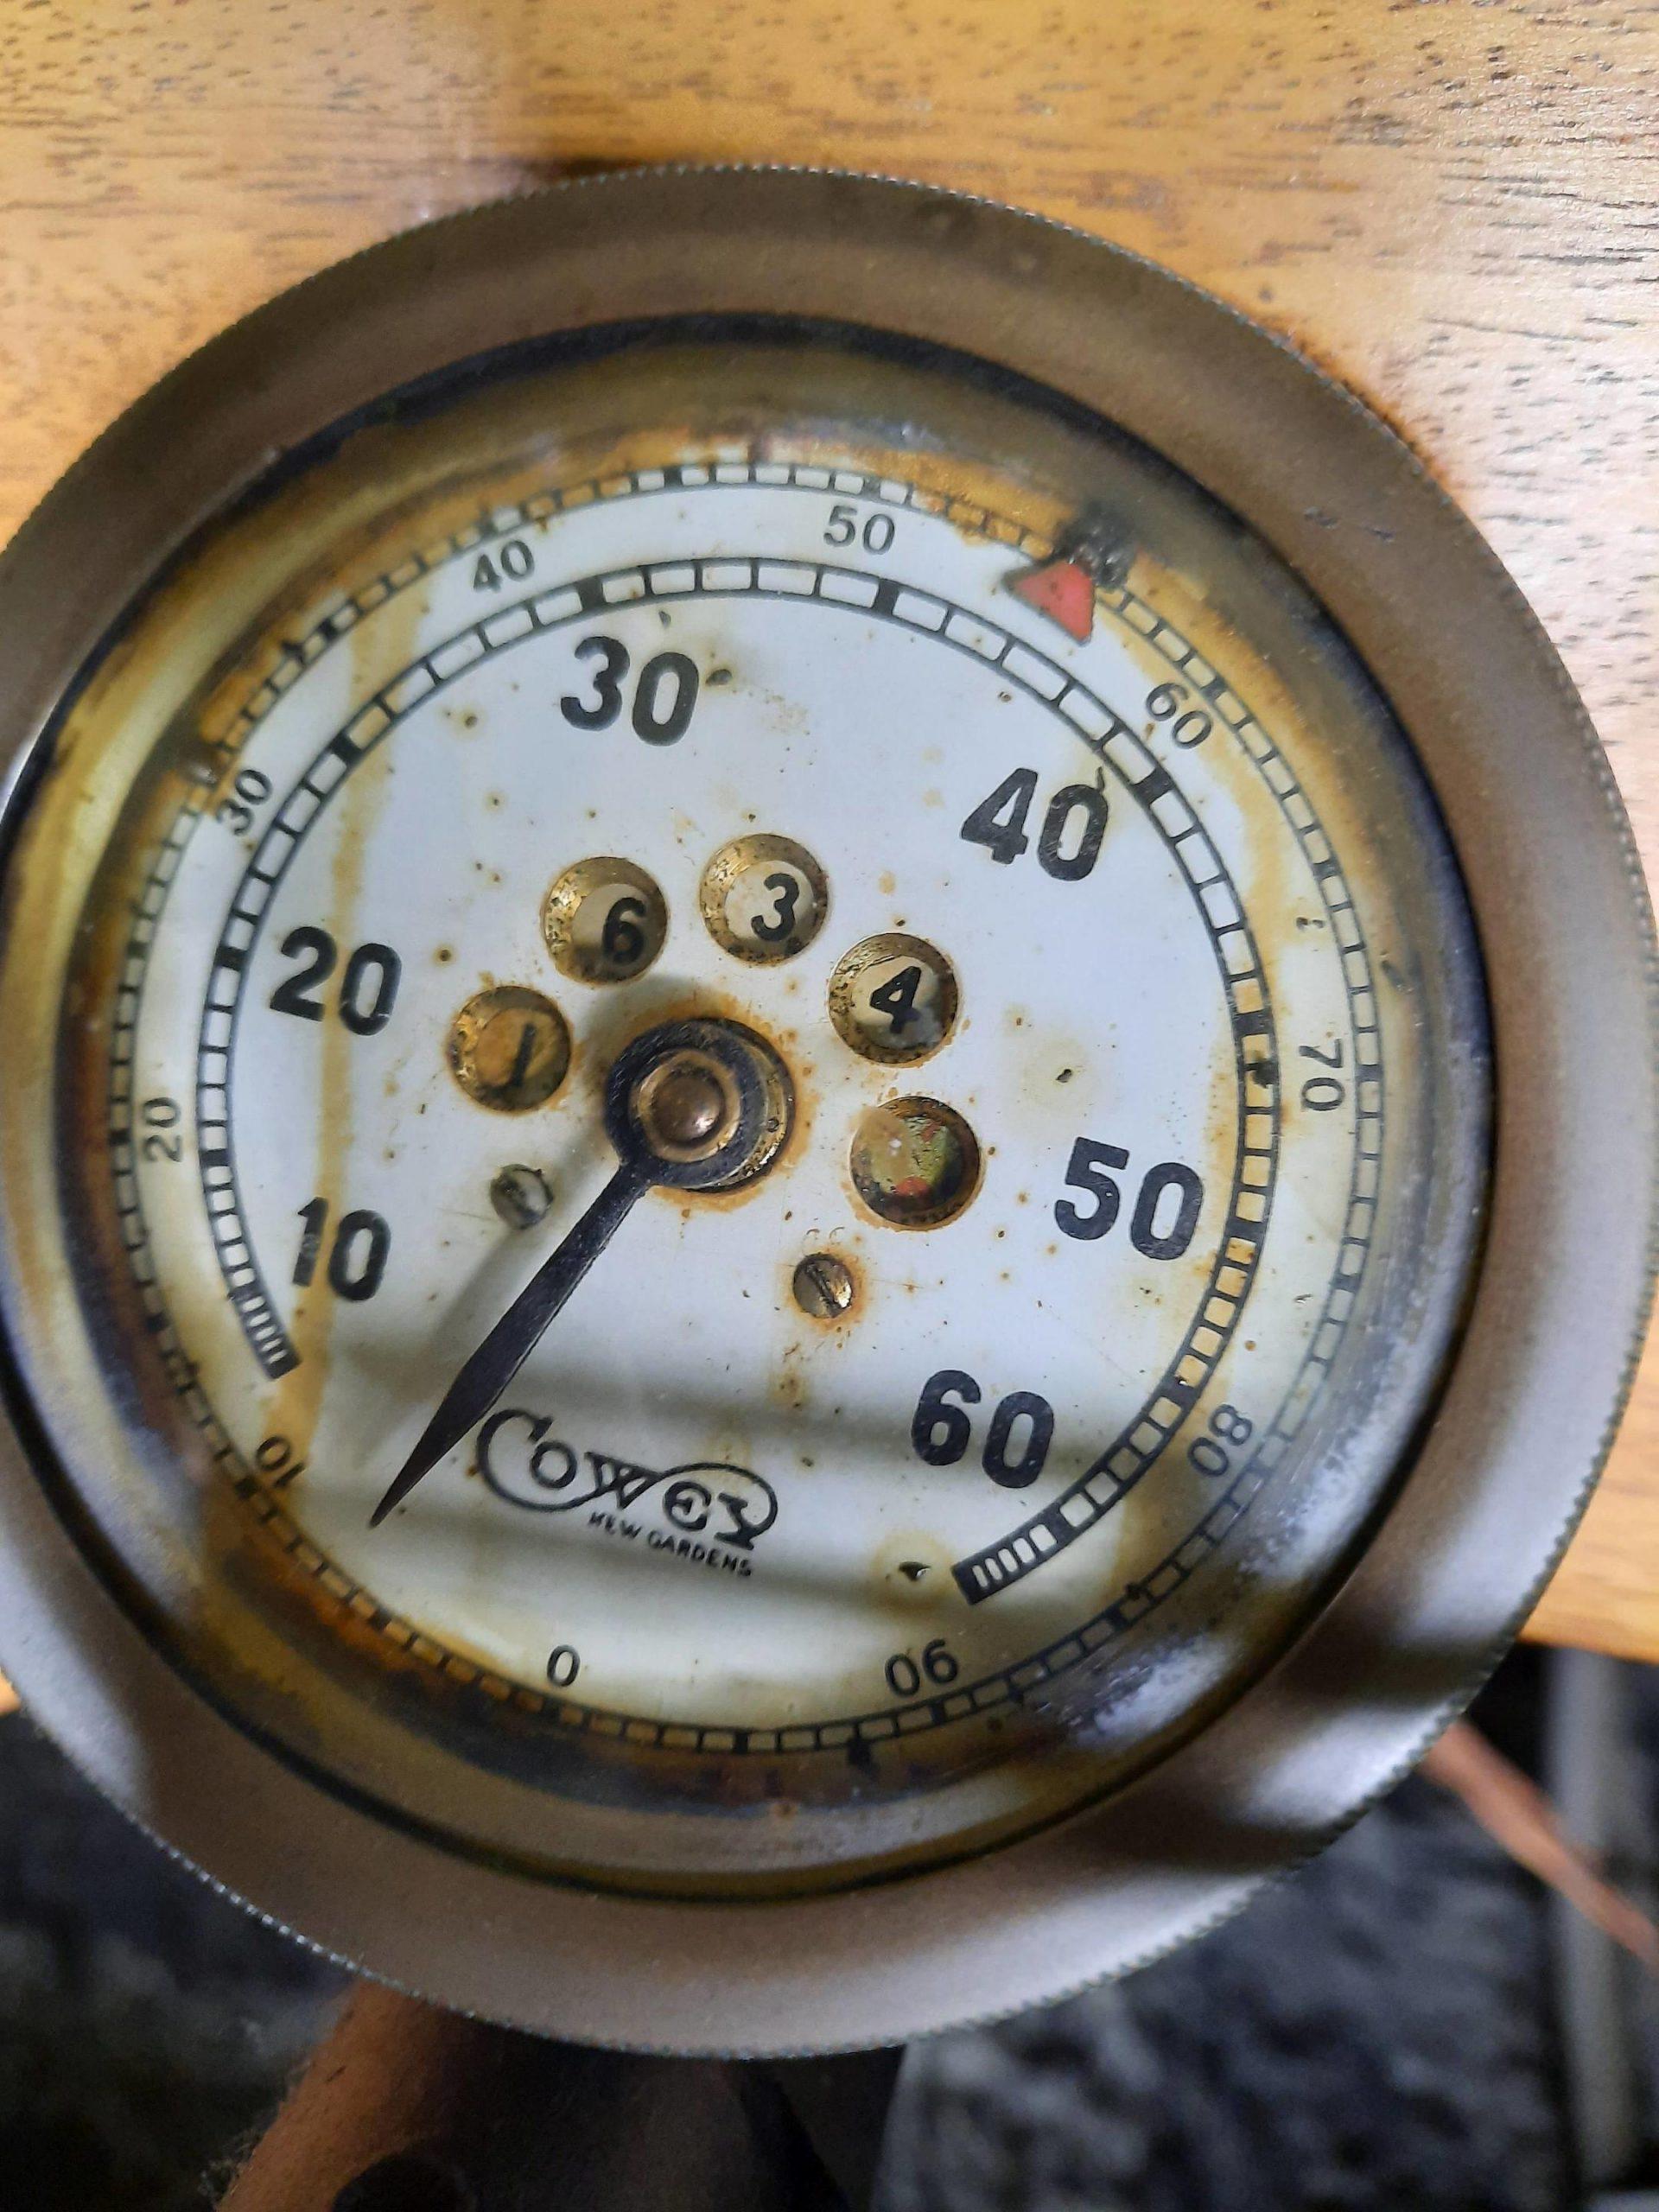 1925 Seal 980CC Motorcycle gauge